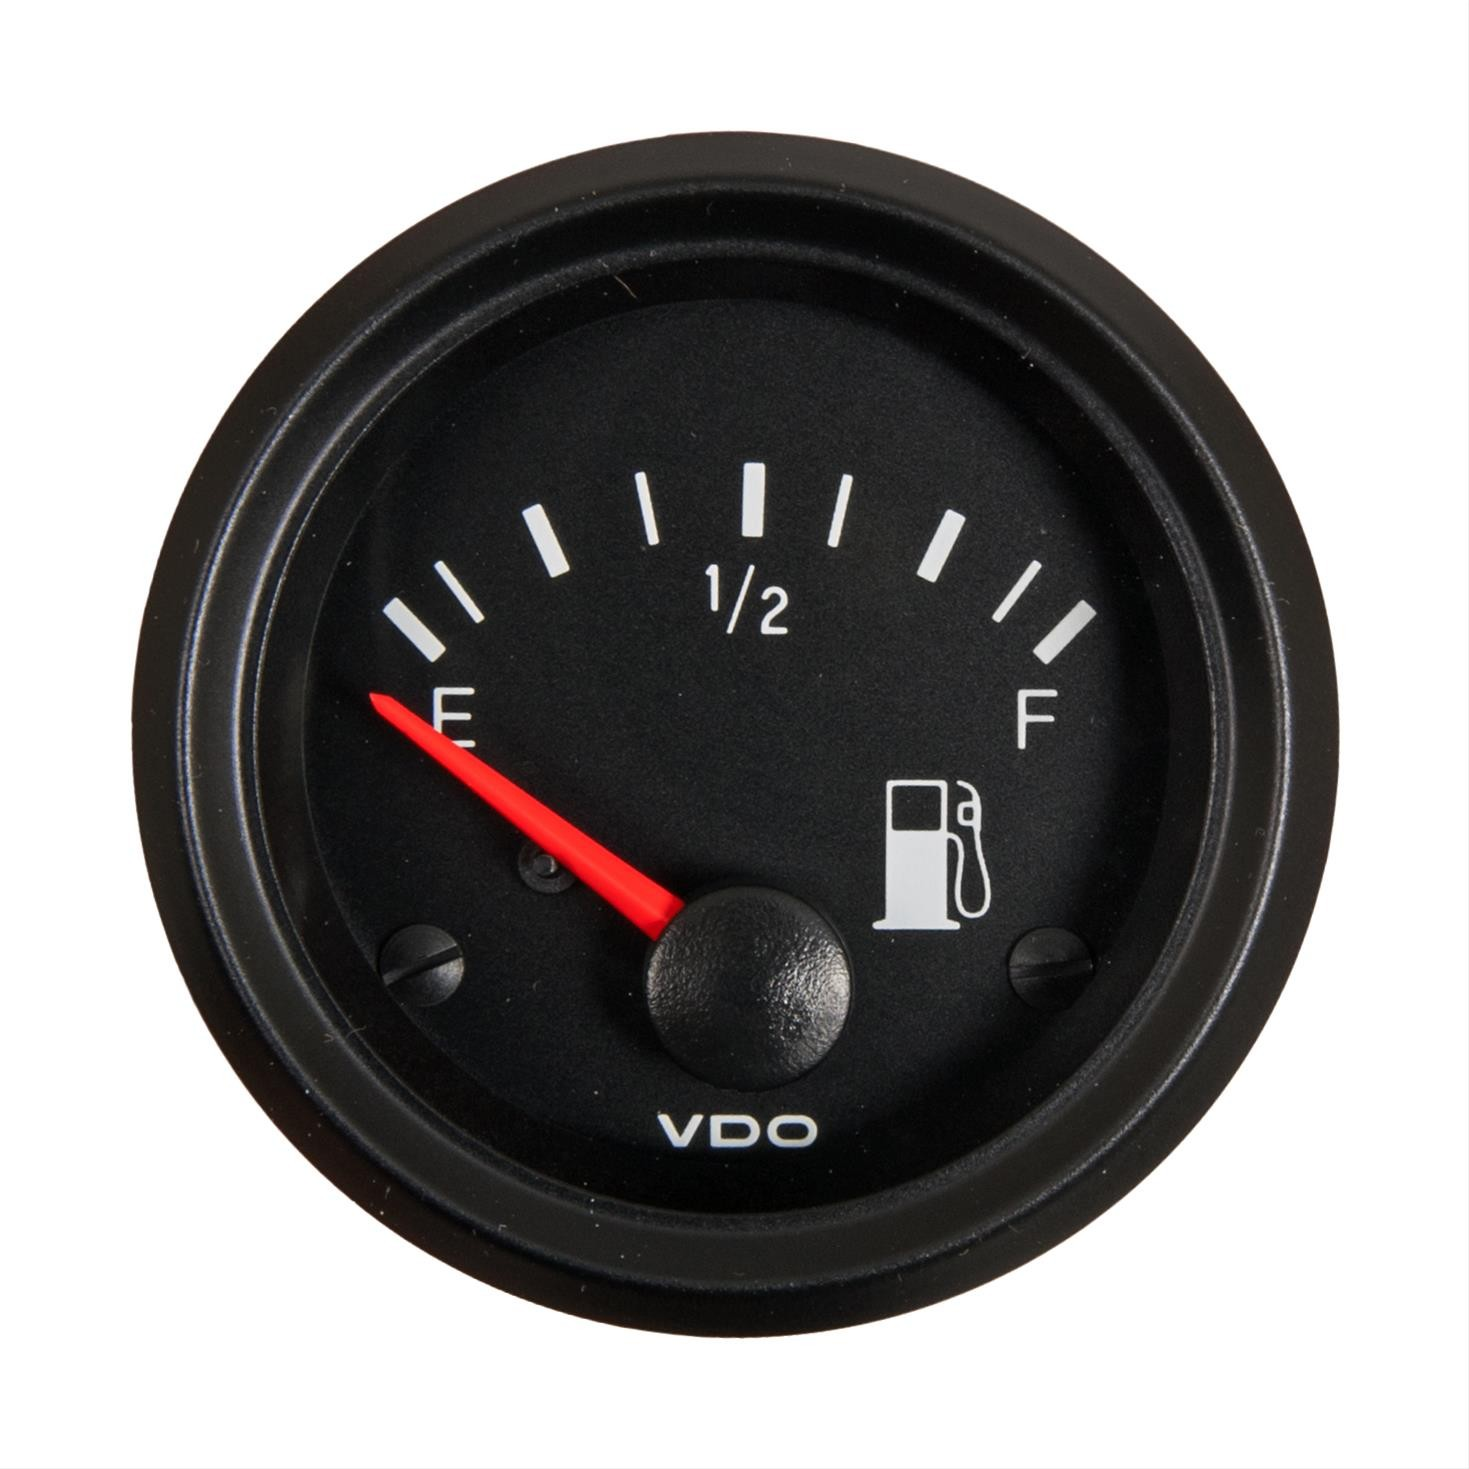 Vdo Oil Electric Gauge Diagram Vdo Cockpit Series Analog Gauges 301 904 Of Vdo Oil Electric Gauge Diagram